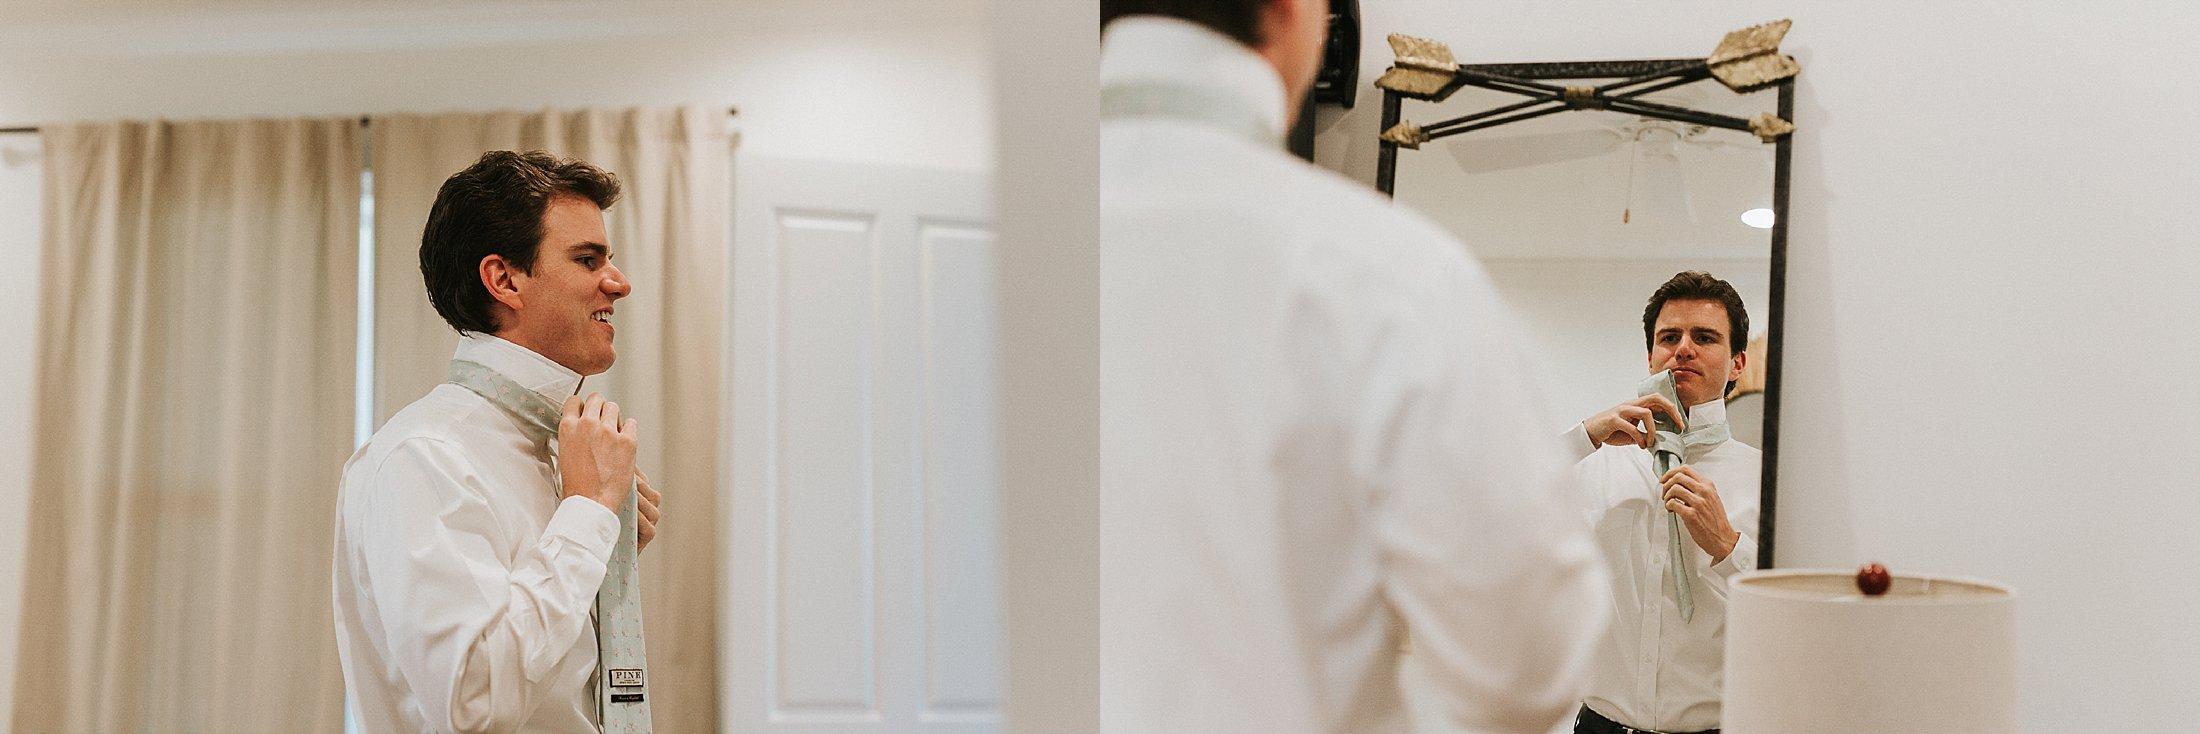 wedding-salons-oxford-ms-1-6.jpg